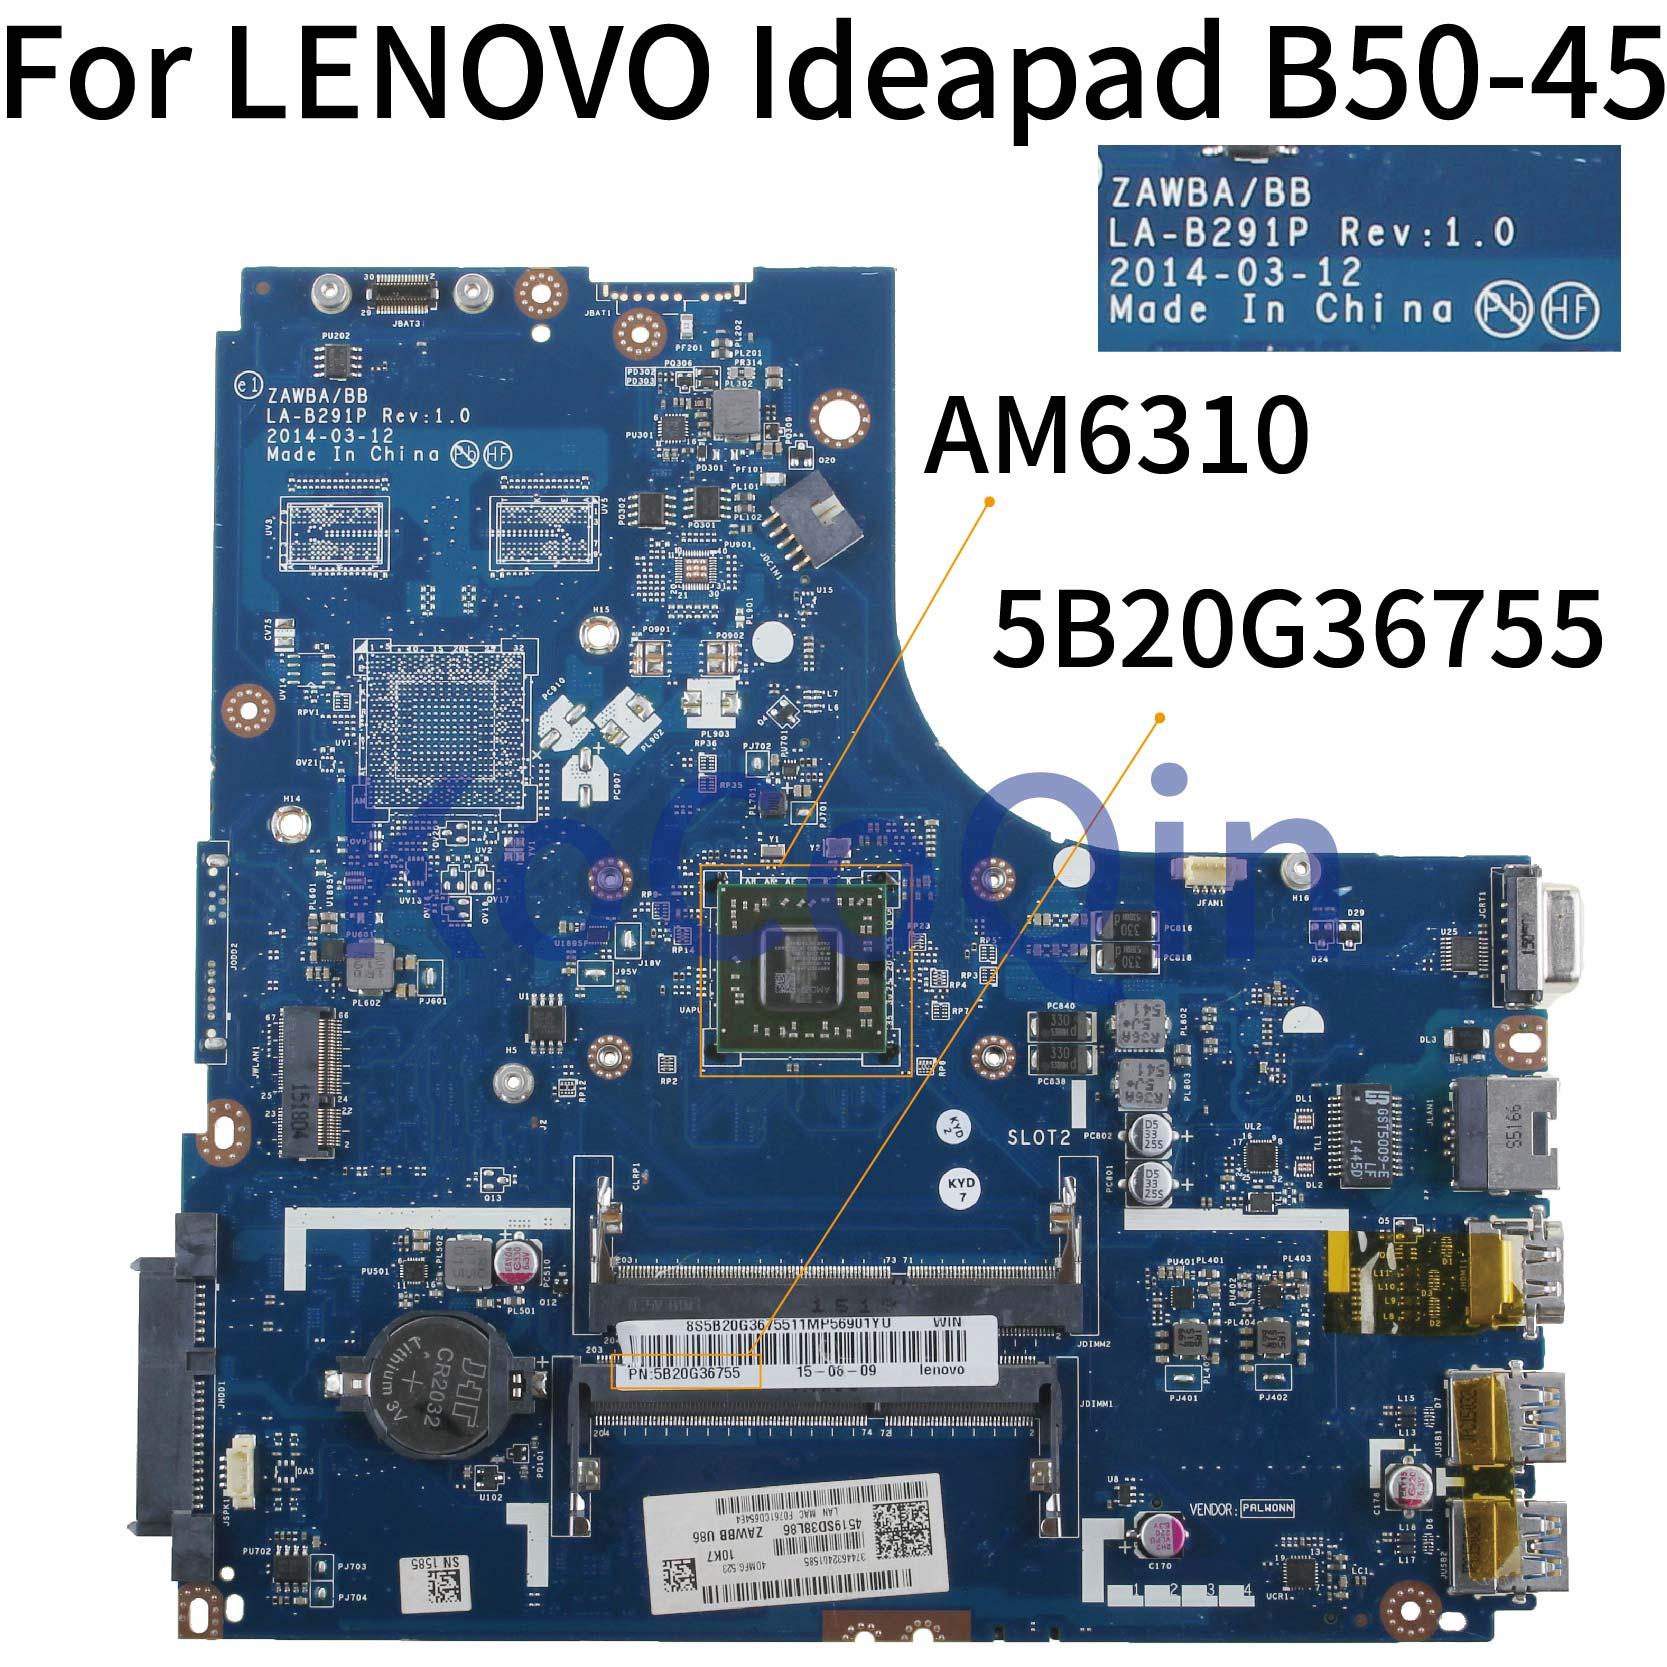 KoCoQin Laptop motherboard For LENOVO Ideapad B50-45 A6-6310 AM6310 Mainboard ZAWBA/BB LA-B291P 5B20G36755